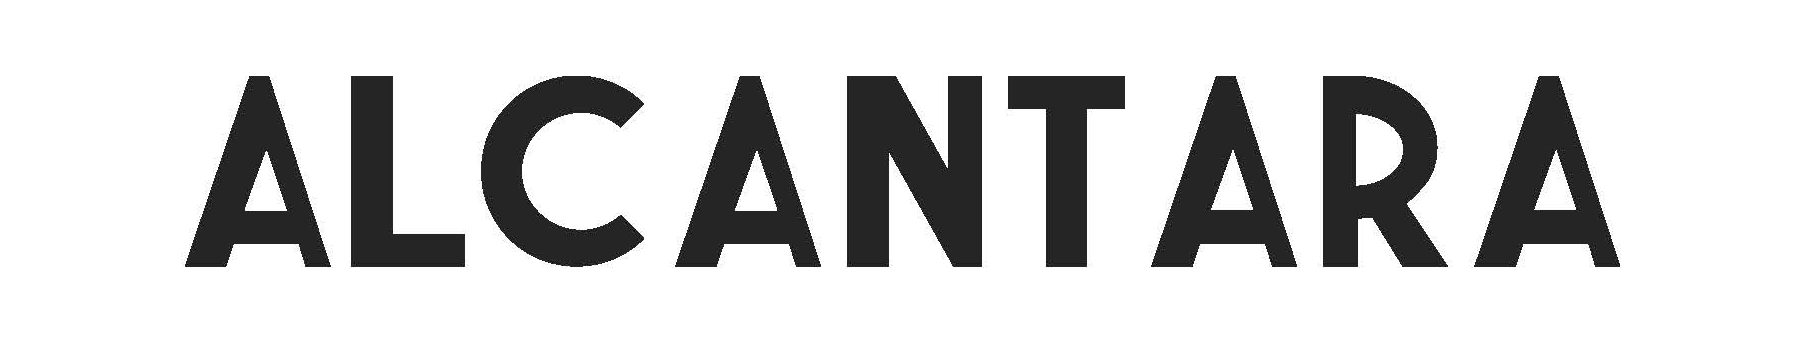 ALCANTARA sponsor